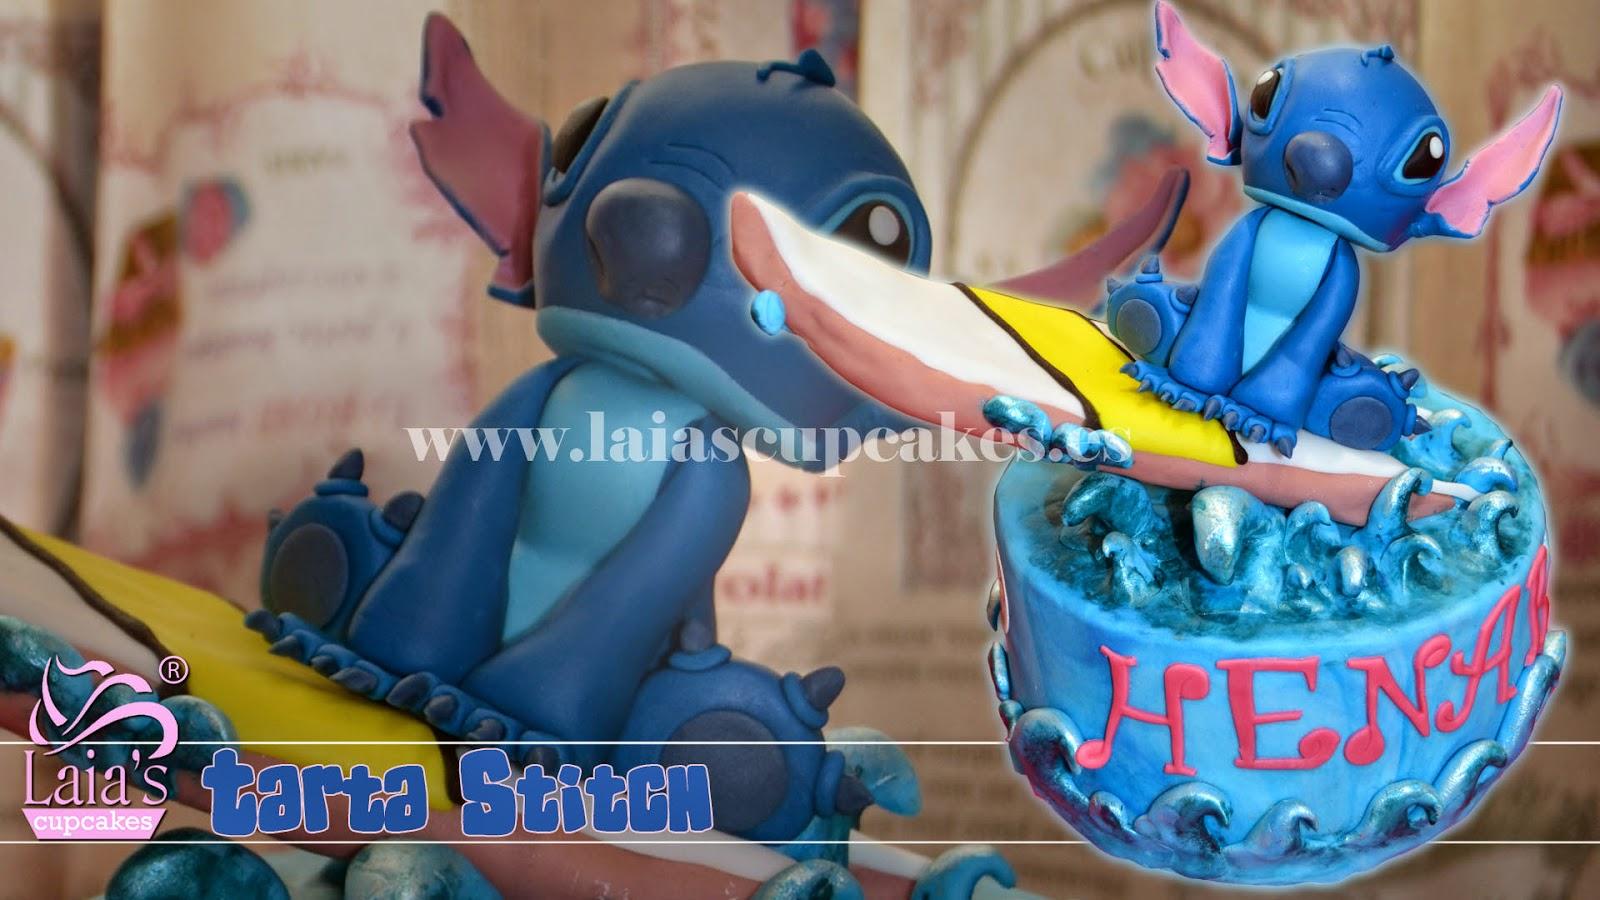 tarta fondant personalizada laia's cupcakes puerto sagunto